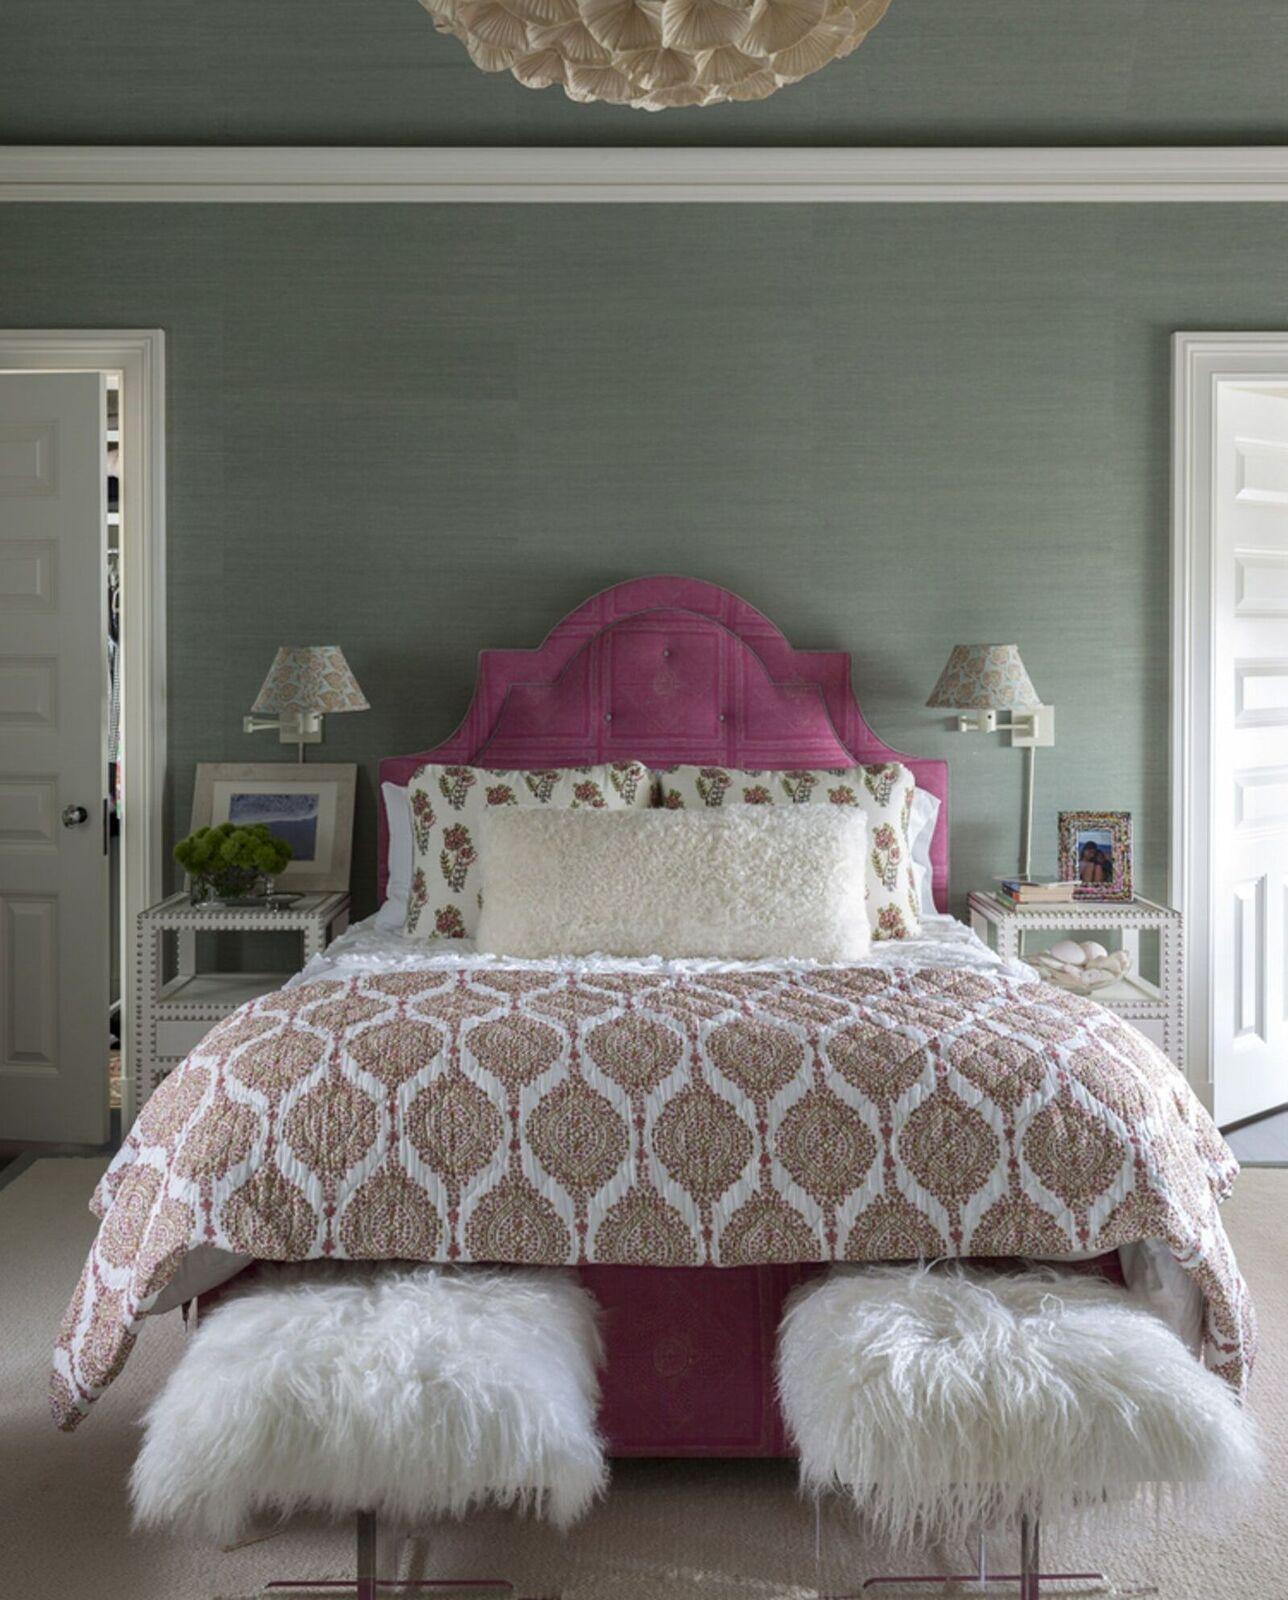 girls-bedroom-4-1539616922.jpg